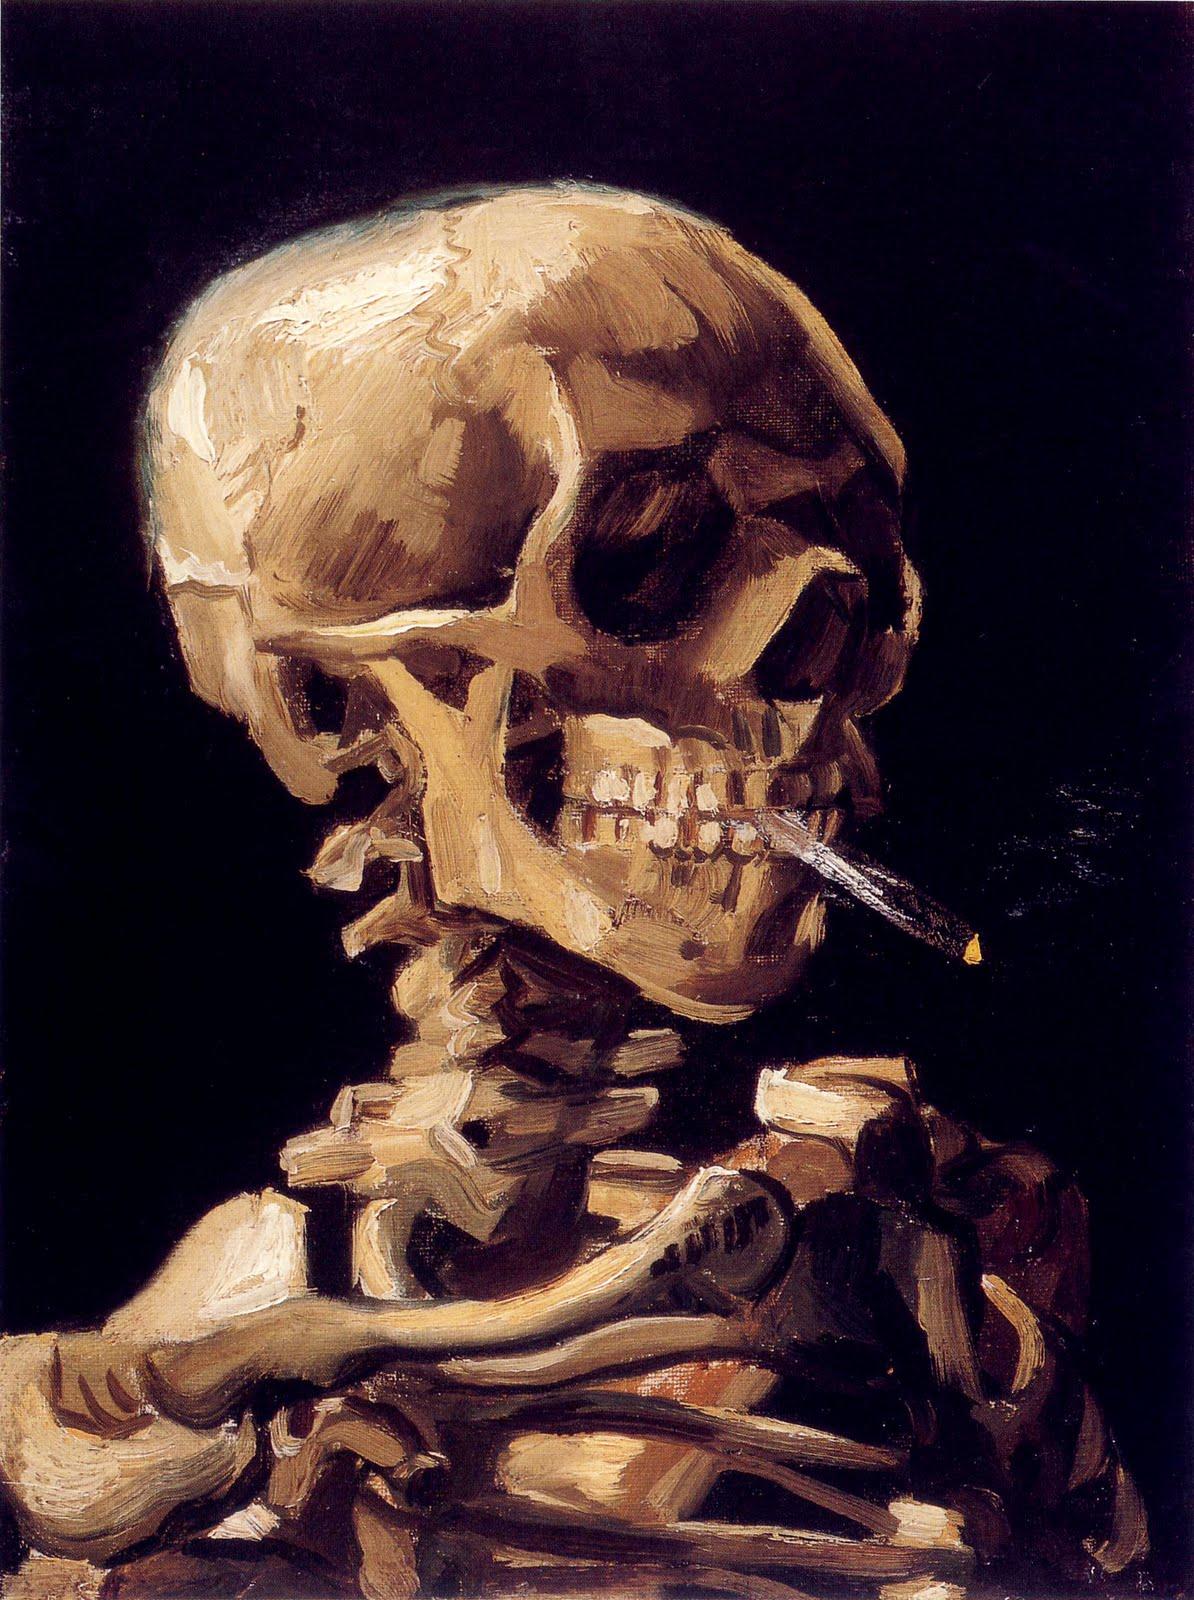 http://2.bp.blogspot.com/_-wlW5BxRhqg/TG78wniPN7I/AAAAAAAAA94/dWuRxyTXy6A/s1600/Skull%2Bwith%2Ba%2Bburning%2Bcigarette.jpg